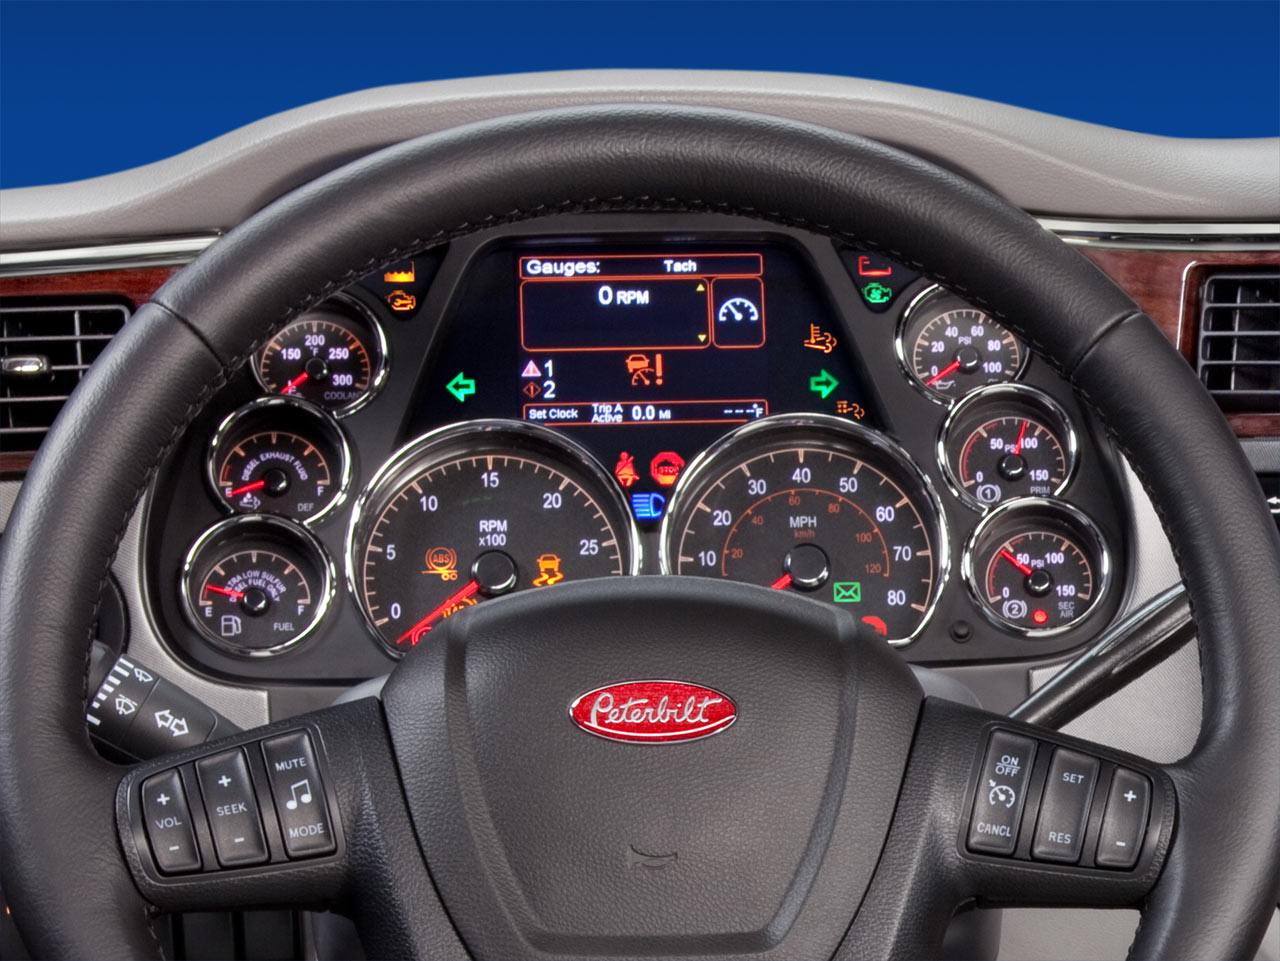 2012 Peterbilt 587 Interior Fuse Box Commercial Vehicles Trucksplanet 1280x961